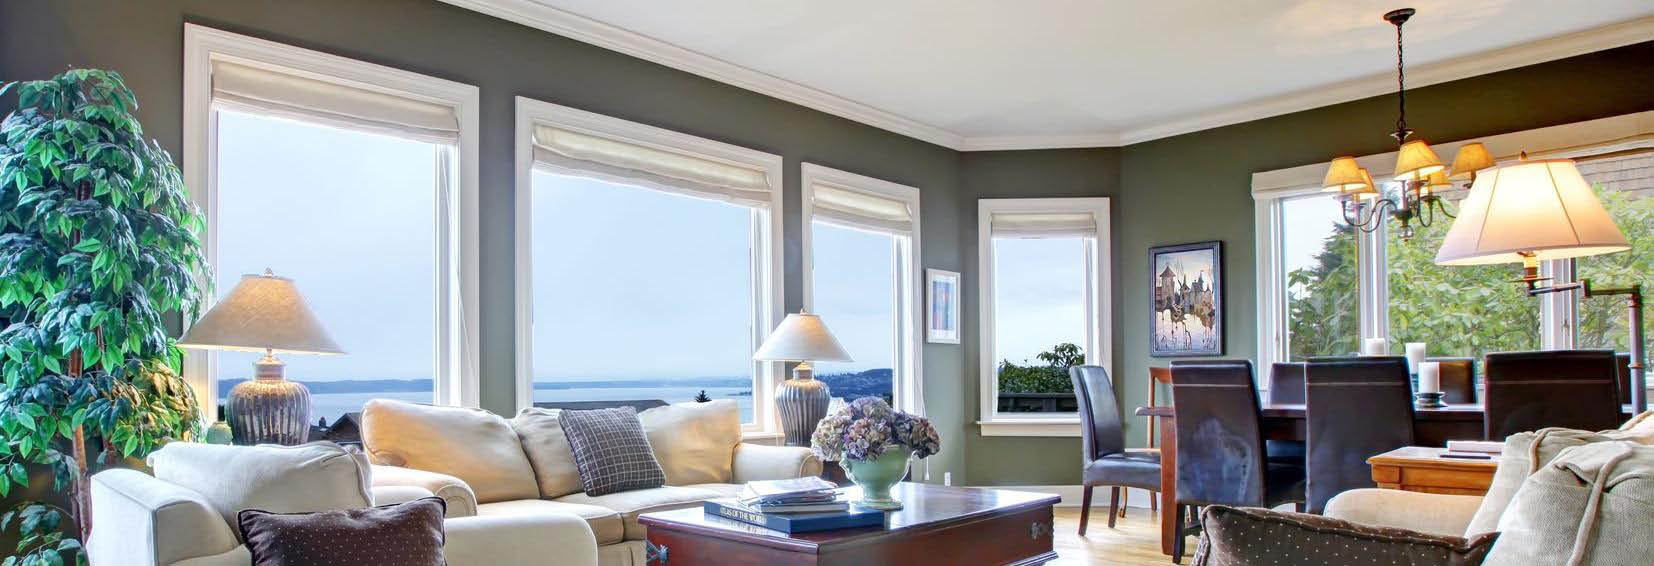 window world window of baltimore picture